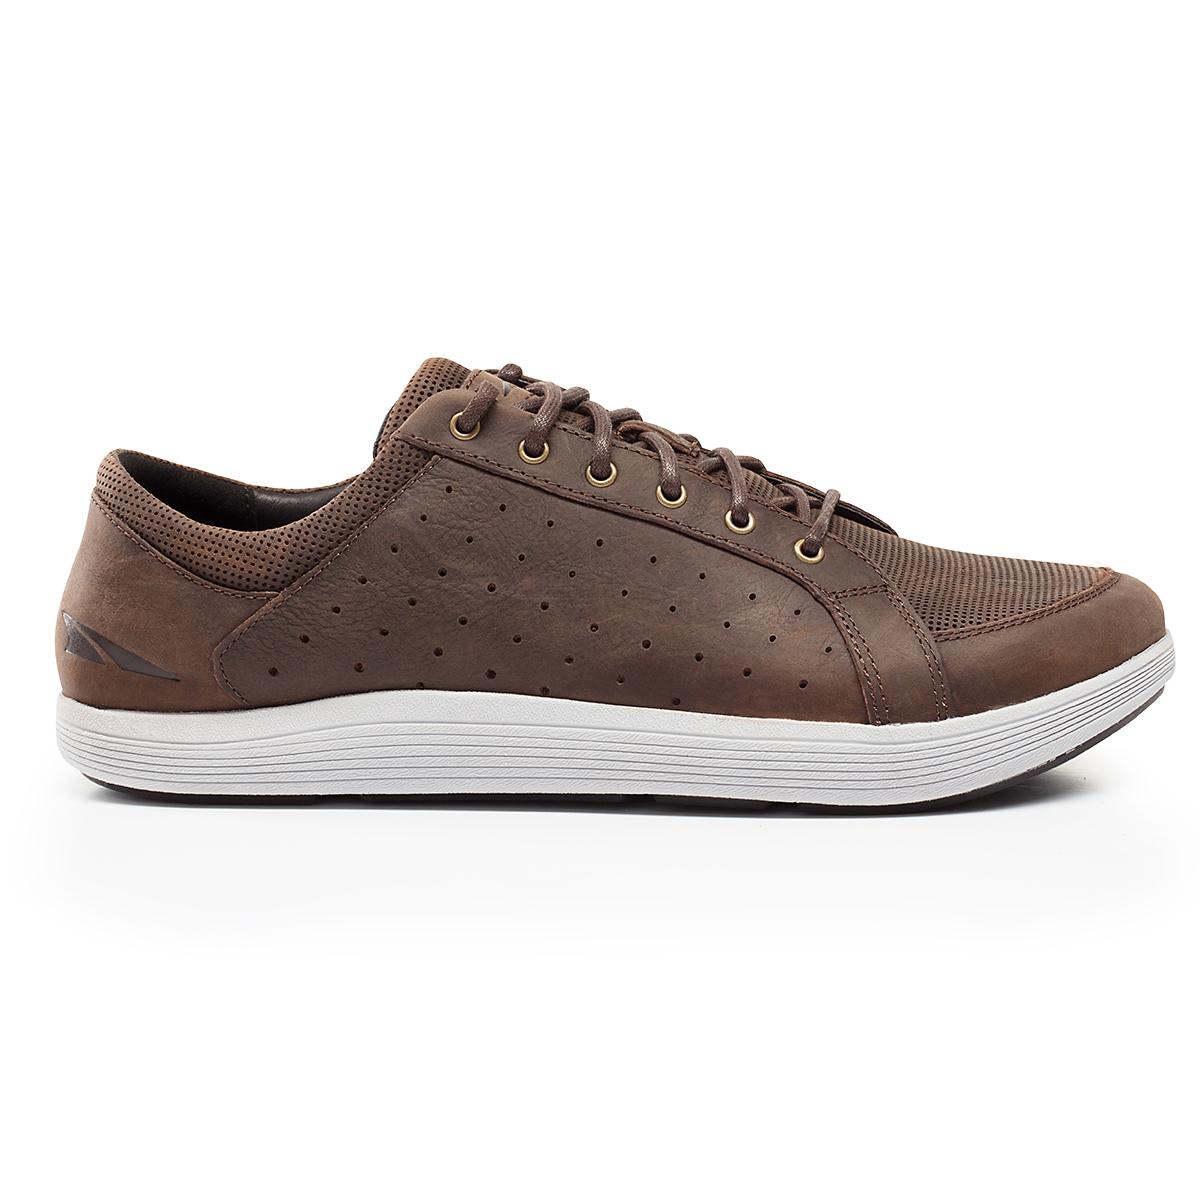 Men's Altra Cayd Lifestyle Shoe - Color: Brown (Regular Width) - Size: 10, Brown, large, image 1